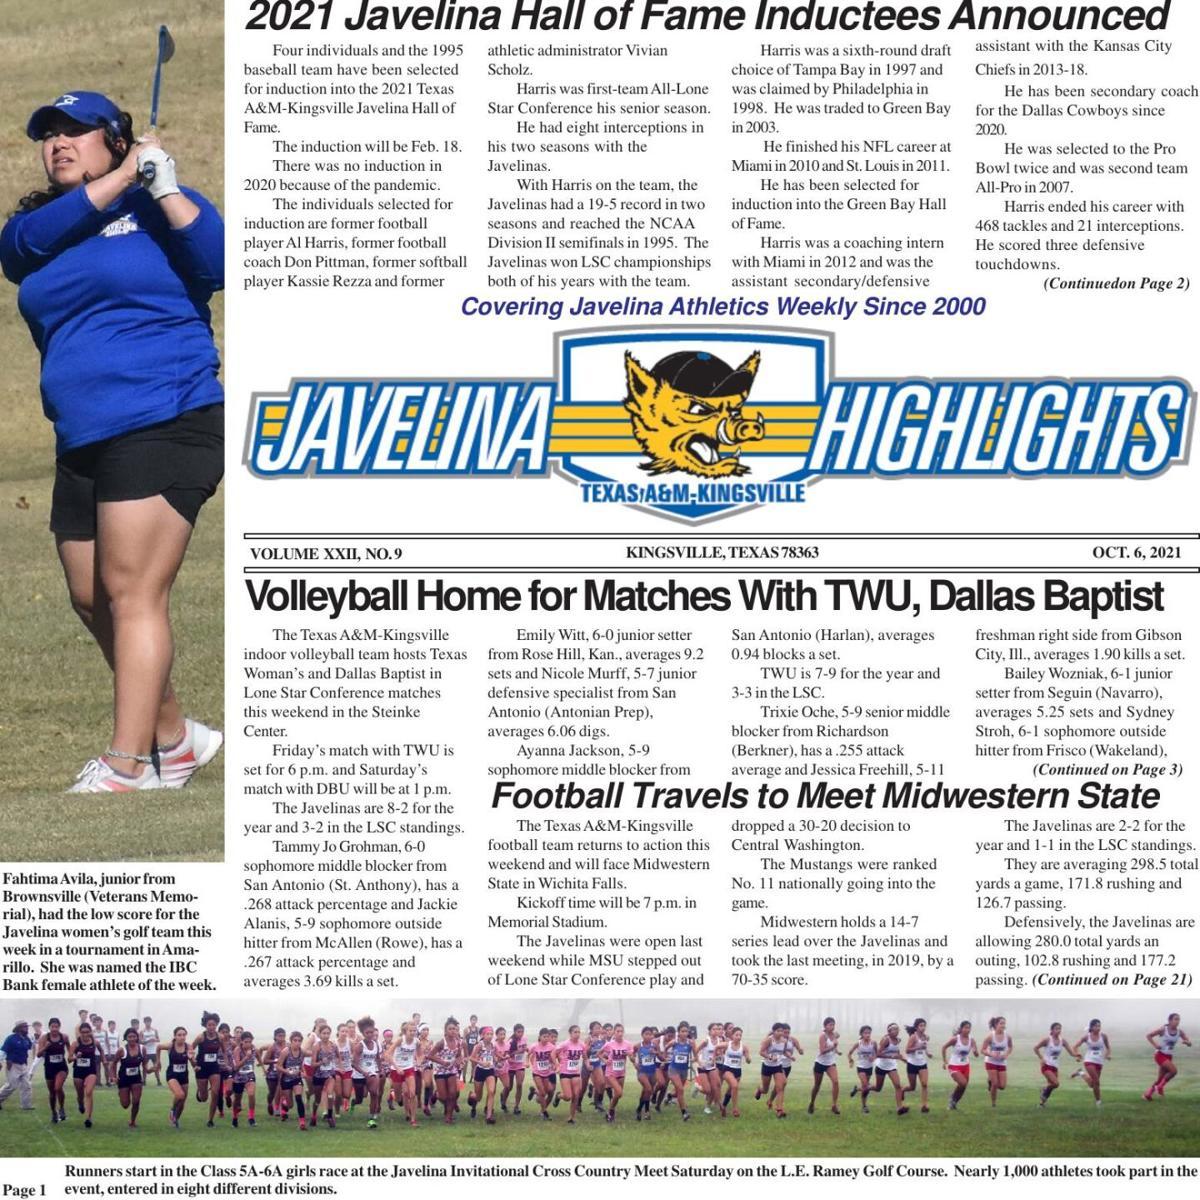 Javelina highlights